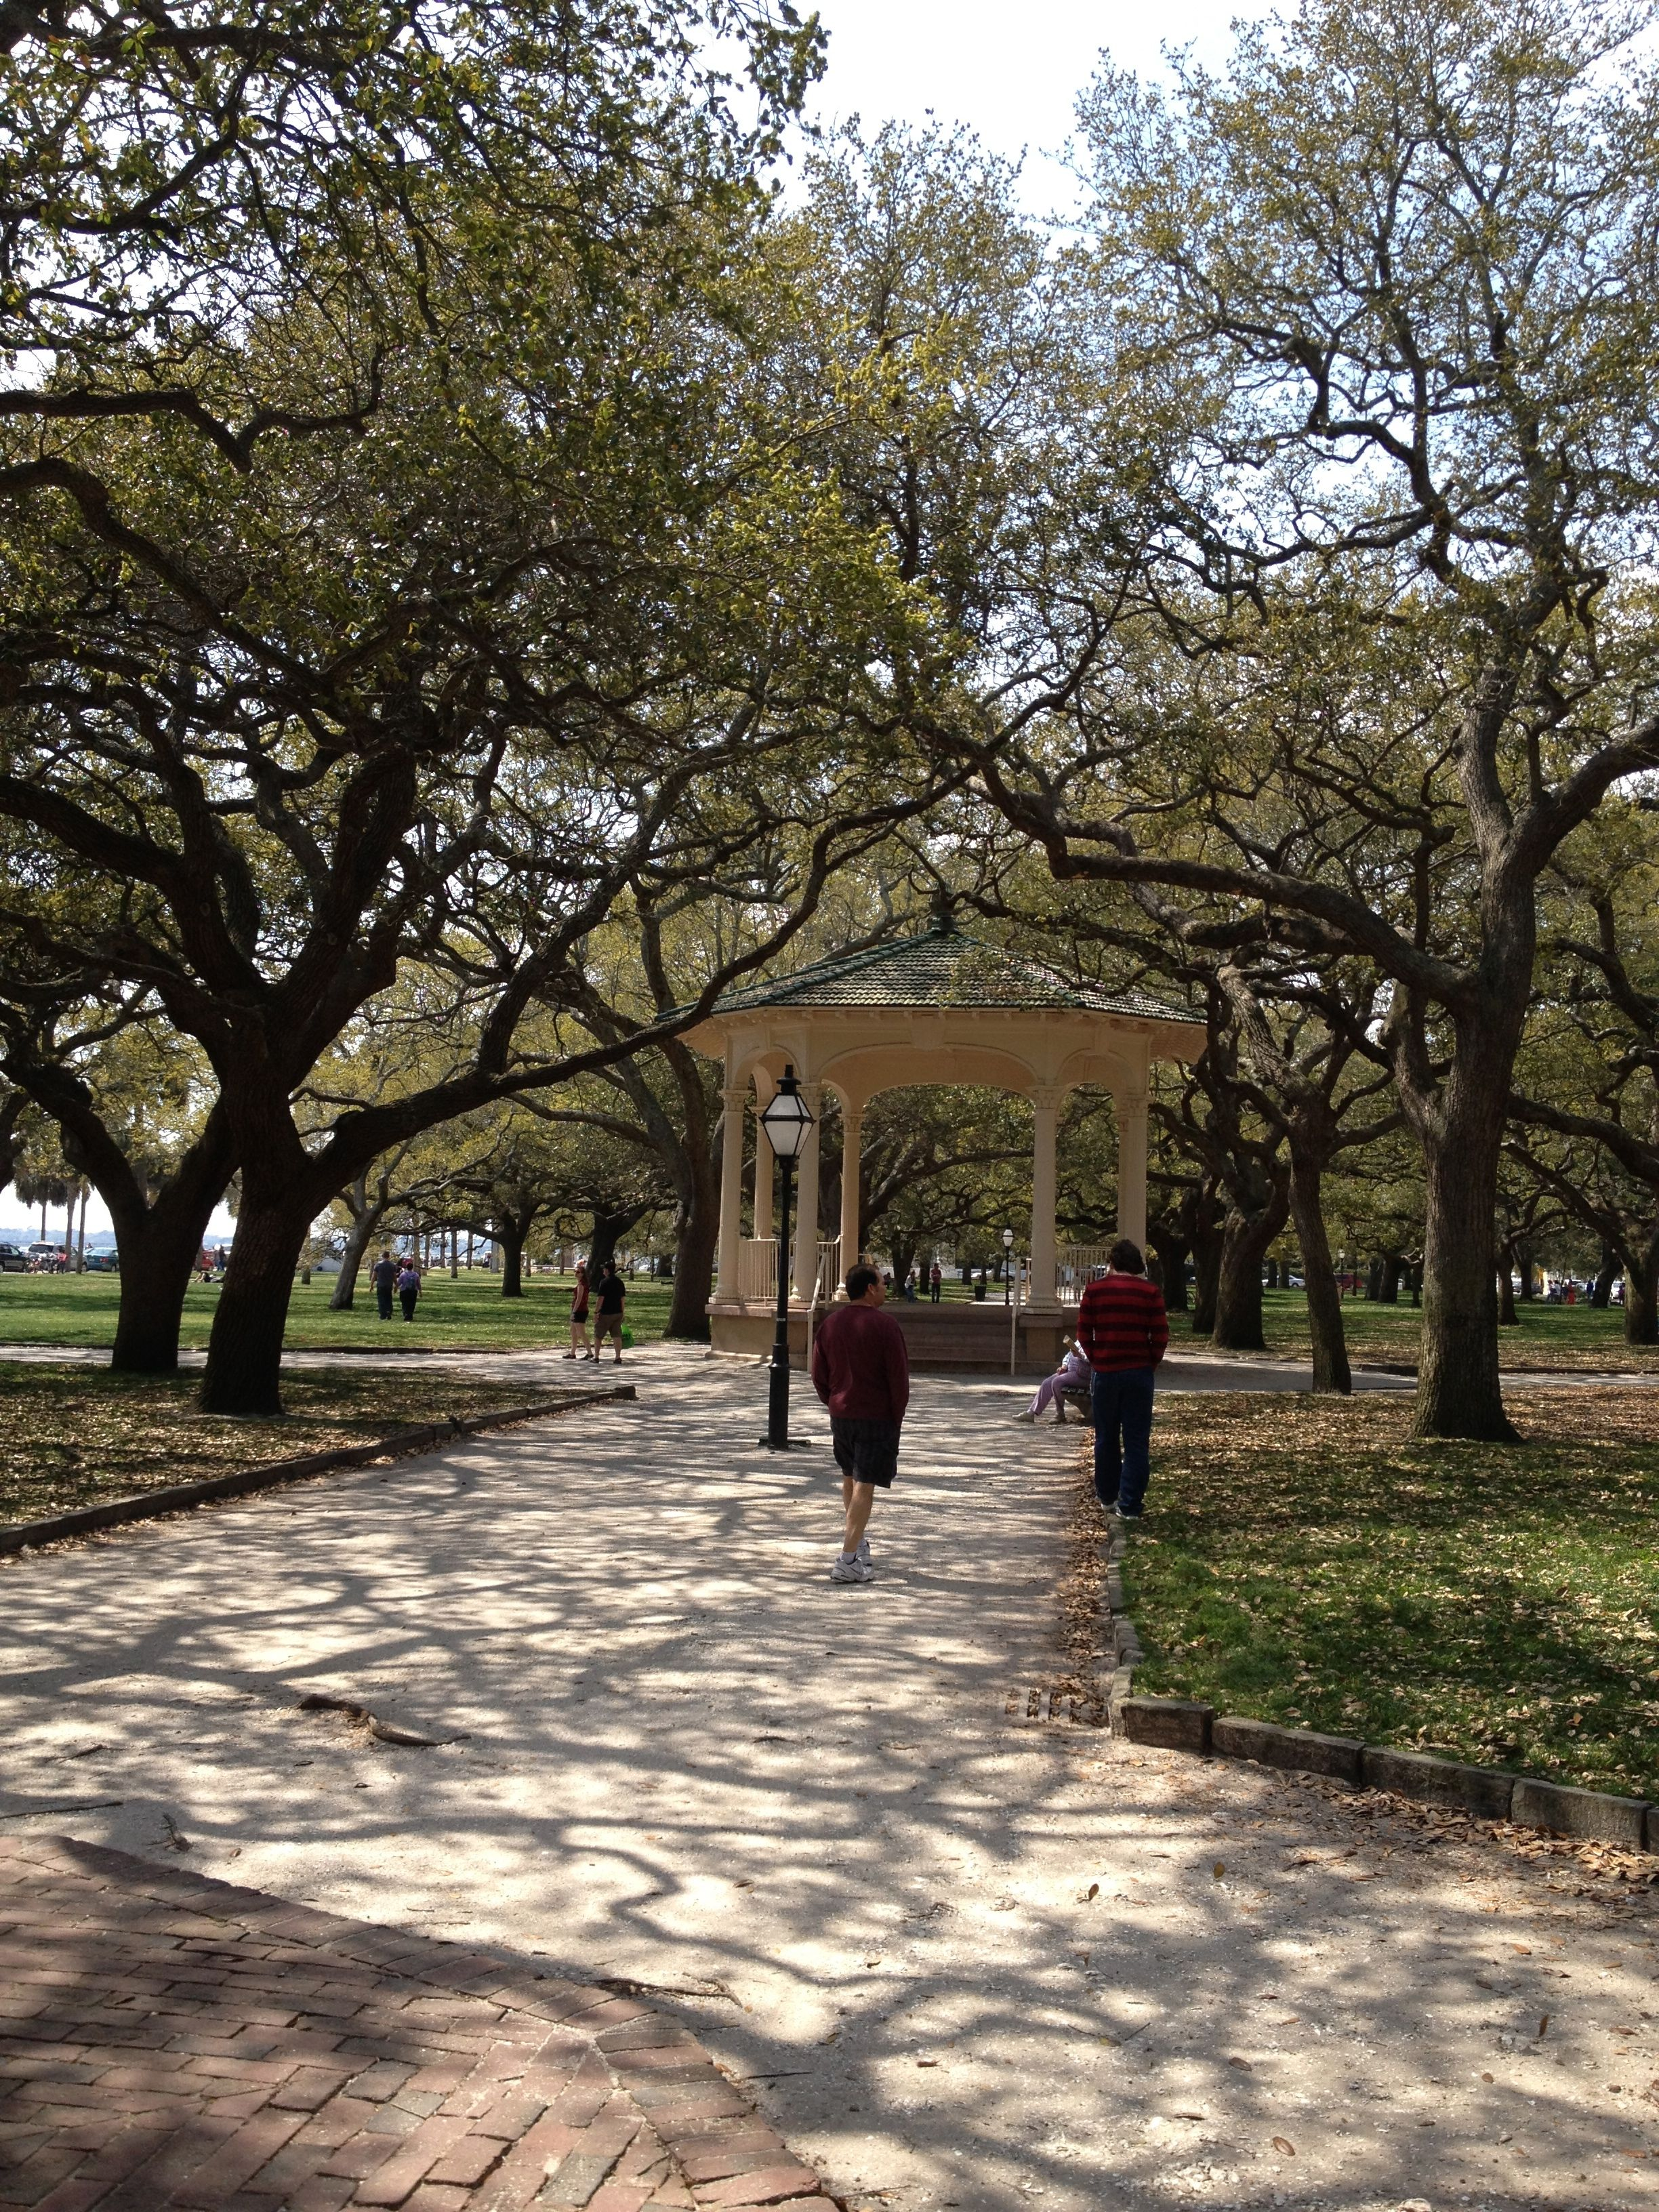 031be3c8f14939a8cec97e0f9dbd6105 - White Point Gardens In Charleston Sc